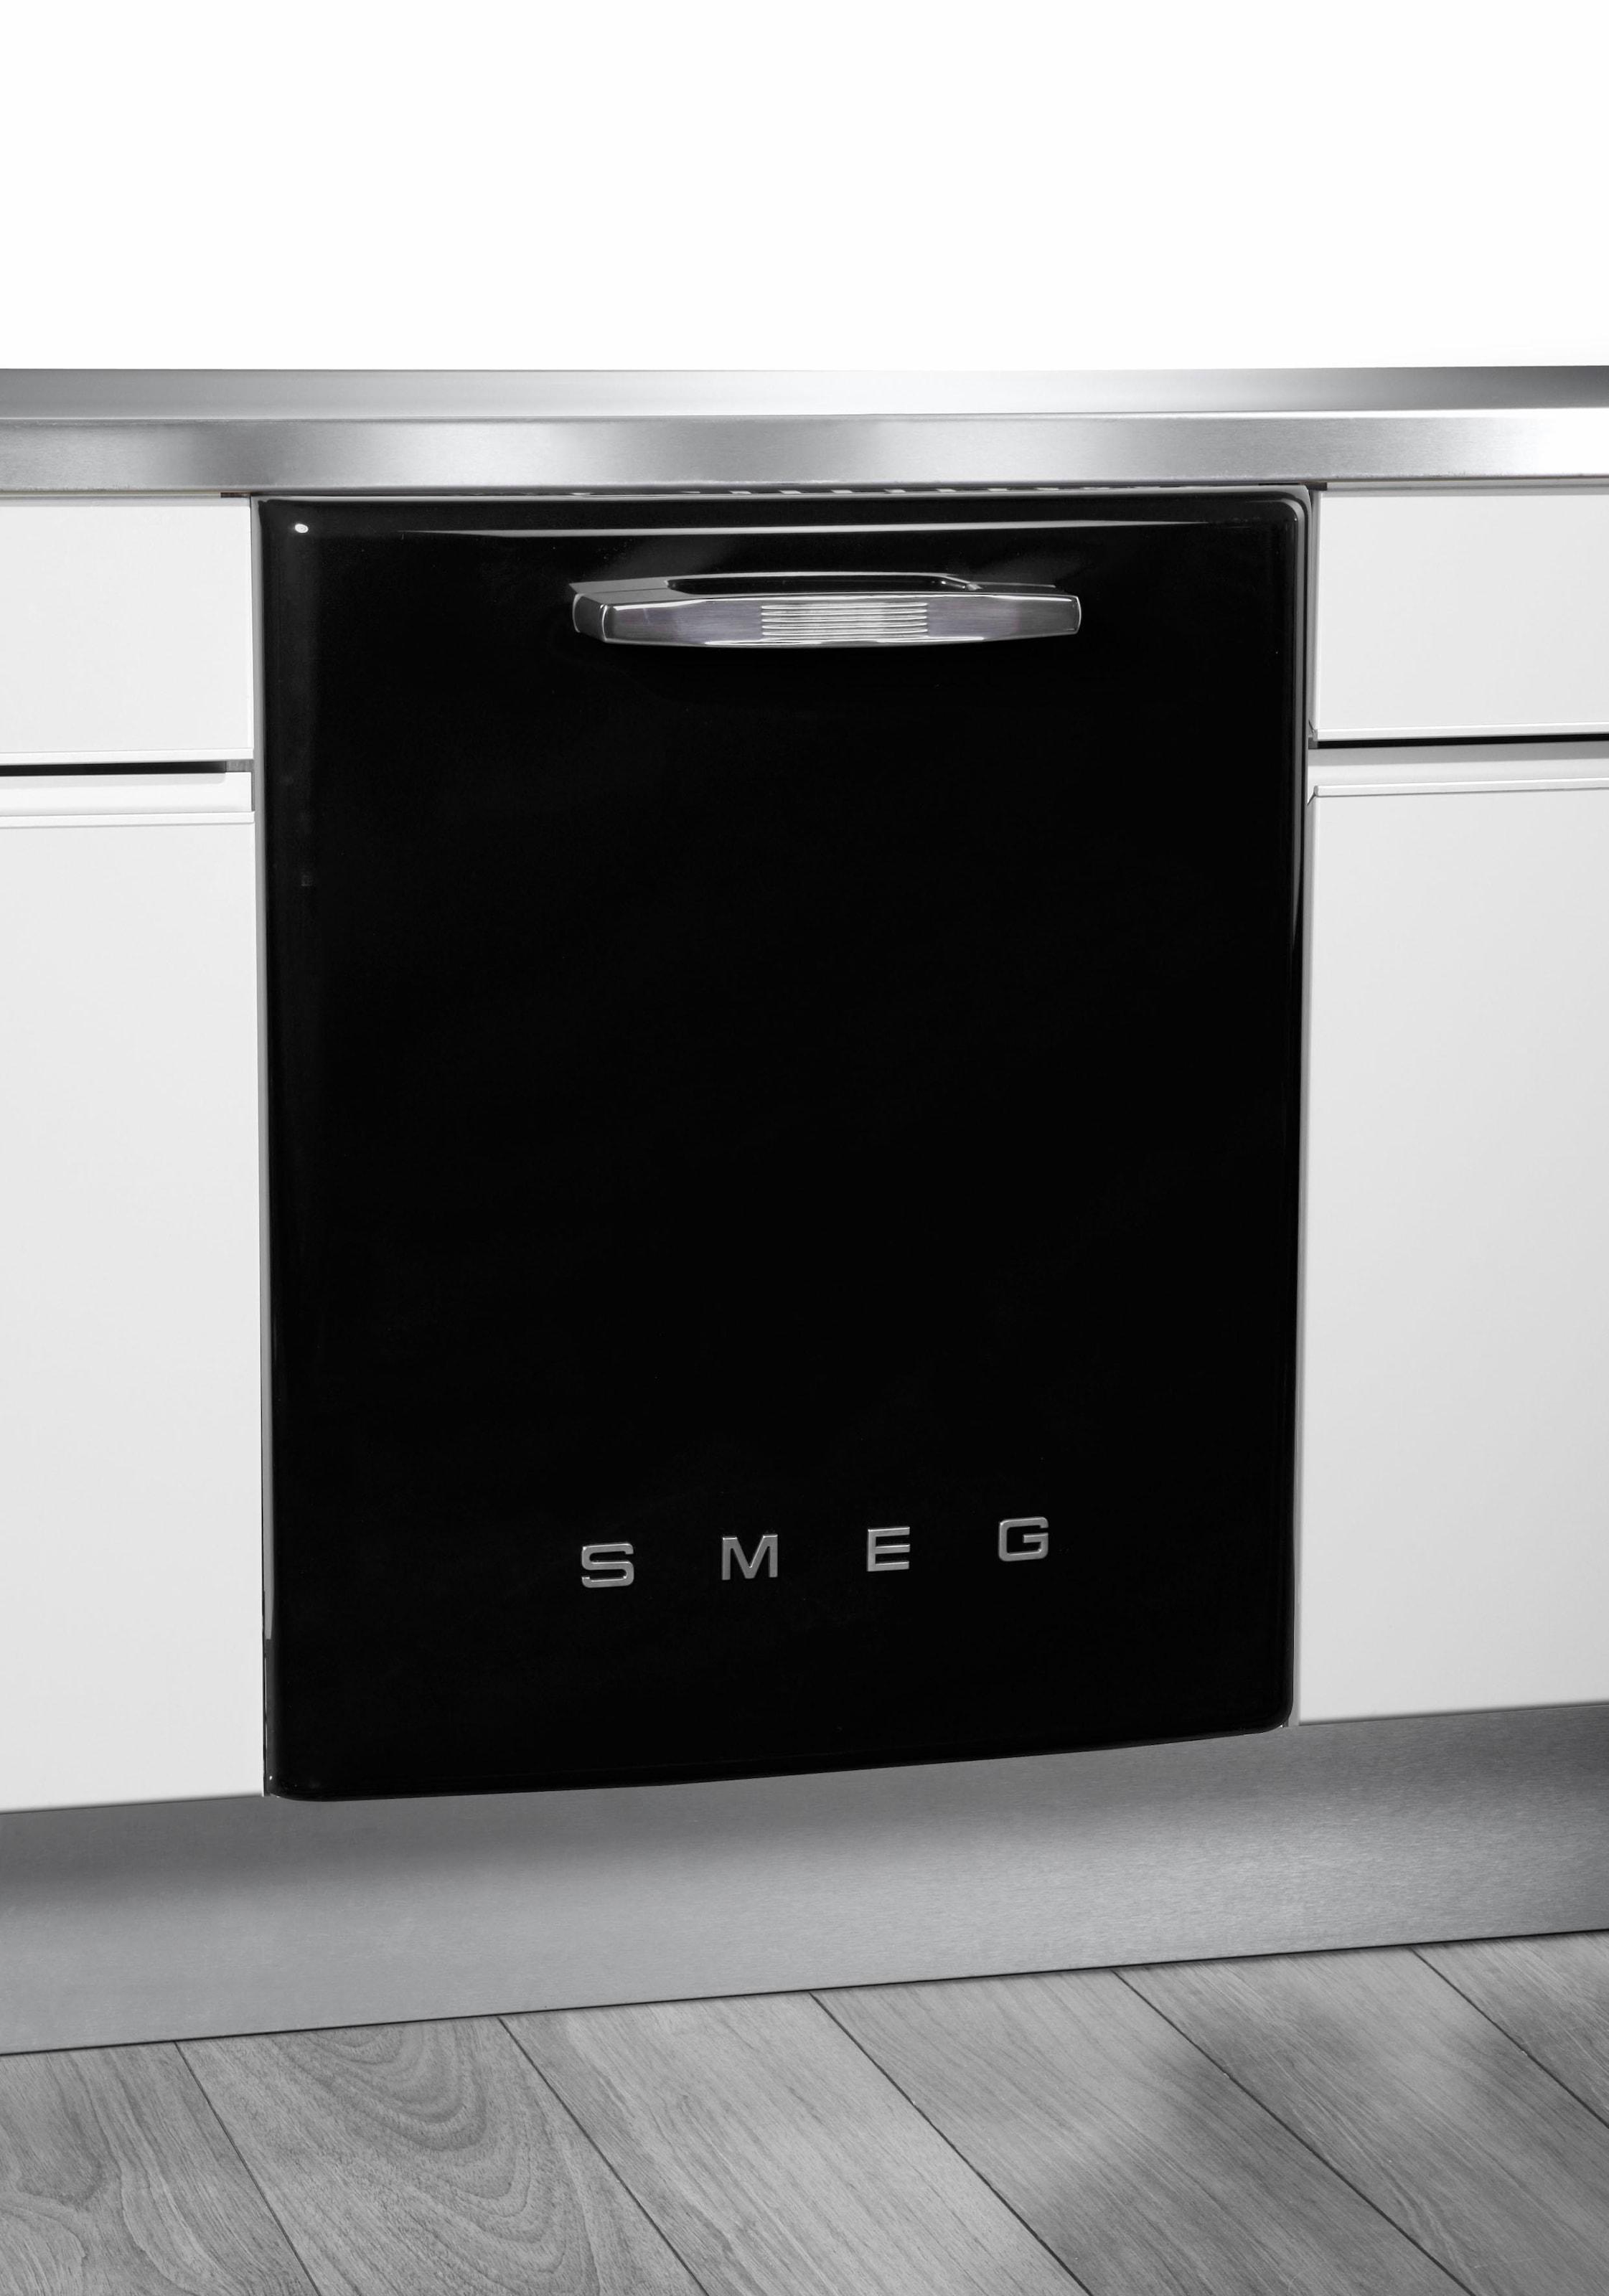 Smeg Kühlschrank Gelb : Smeg küchengeräte online kaufen smeg bei baur